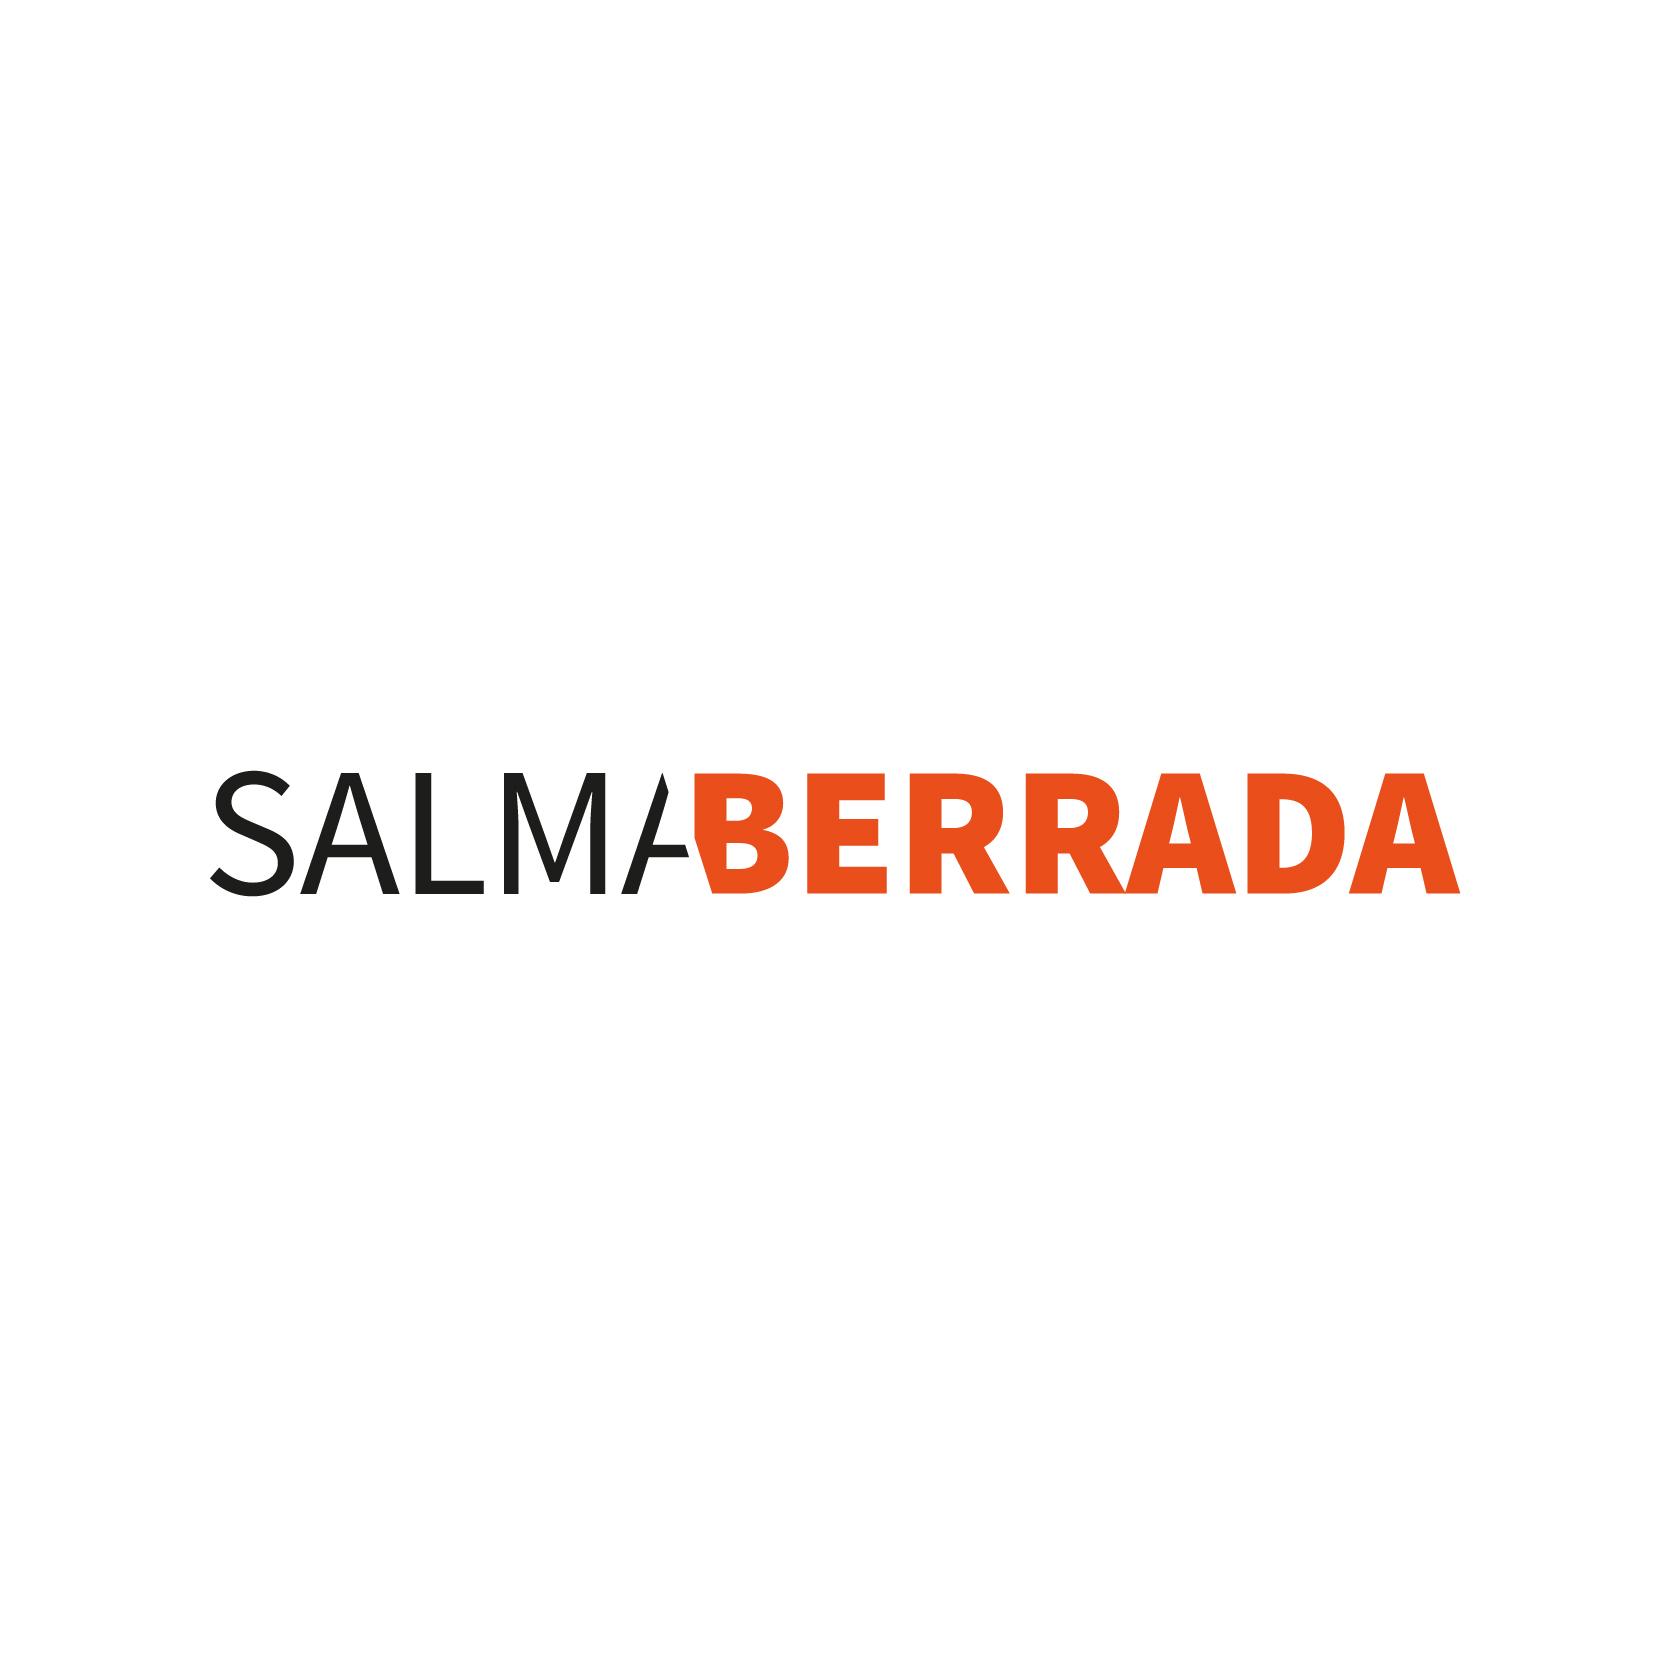 logo_Salma_bi-color_light